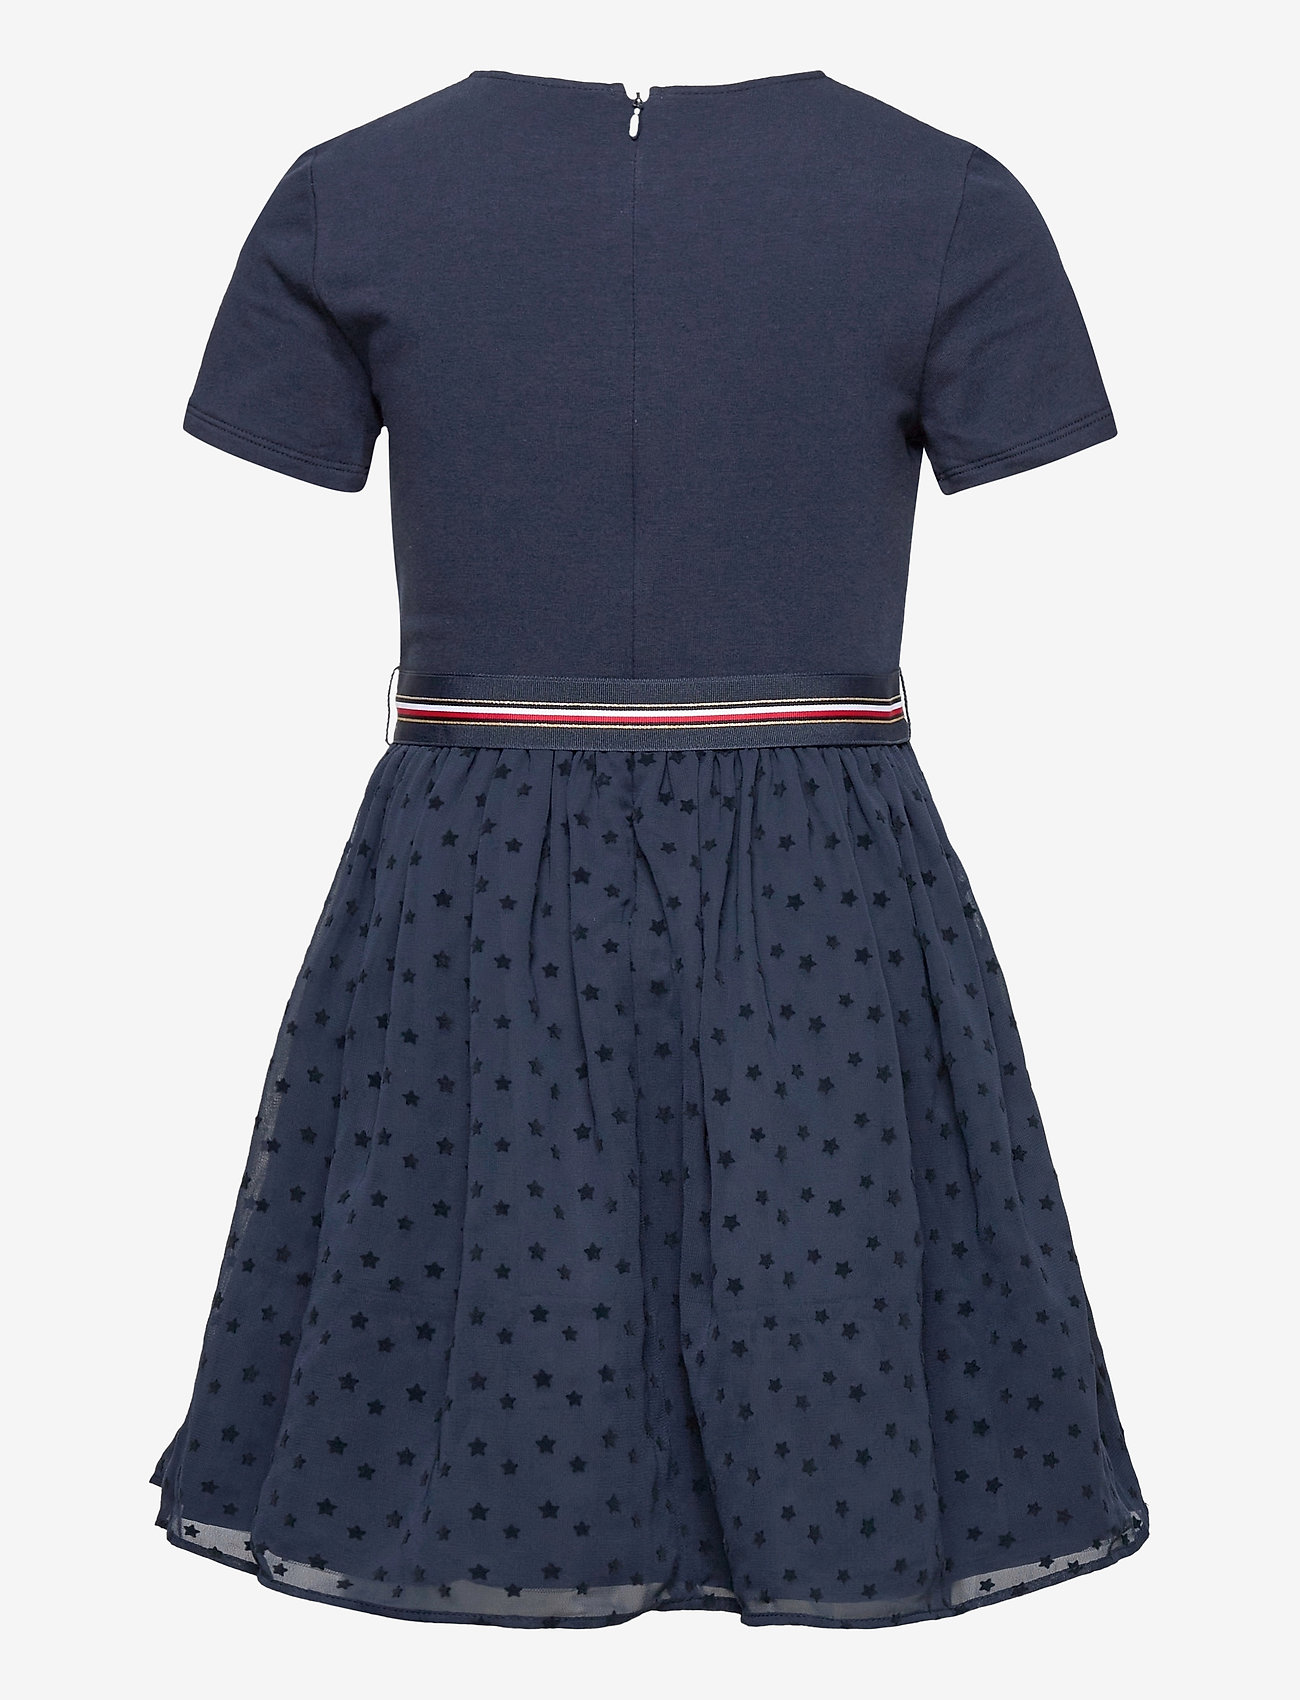 Tommy Hilfiger - COMBI DRESS S/S - dresses - twilight navy - 1